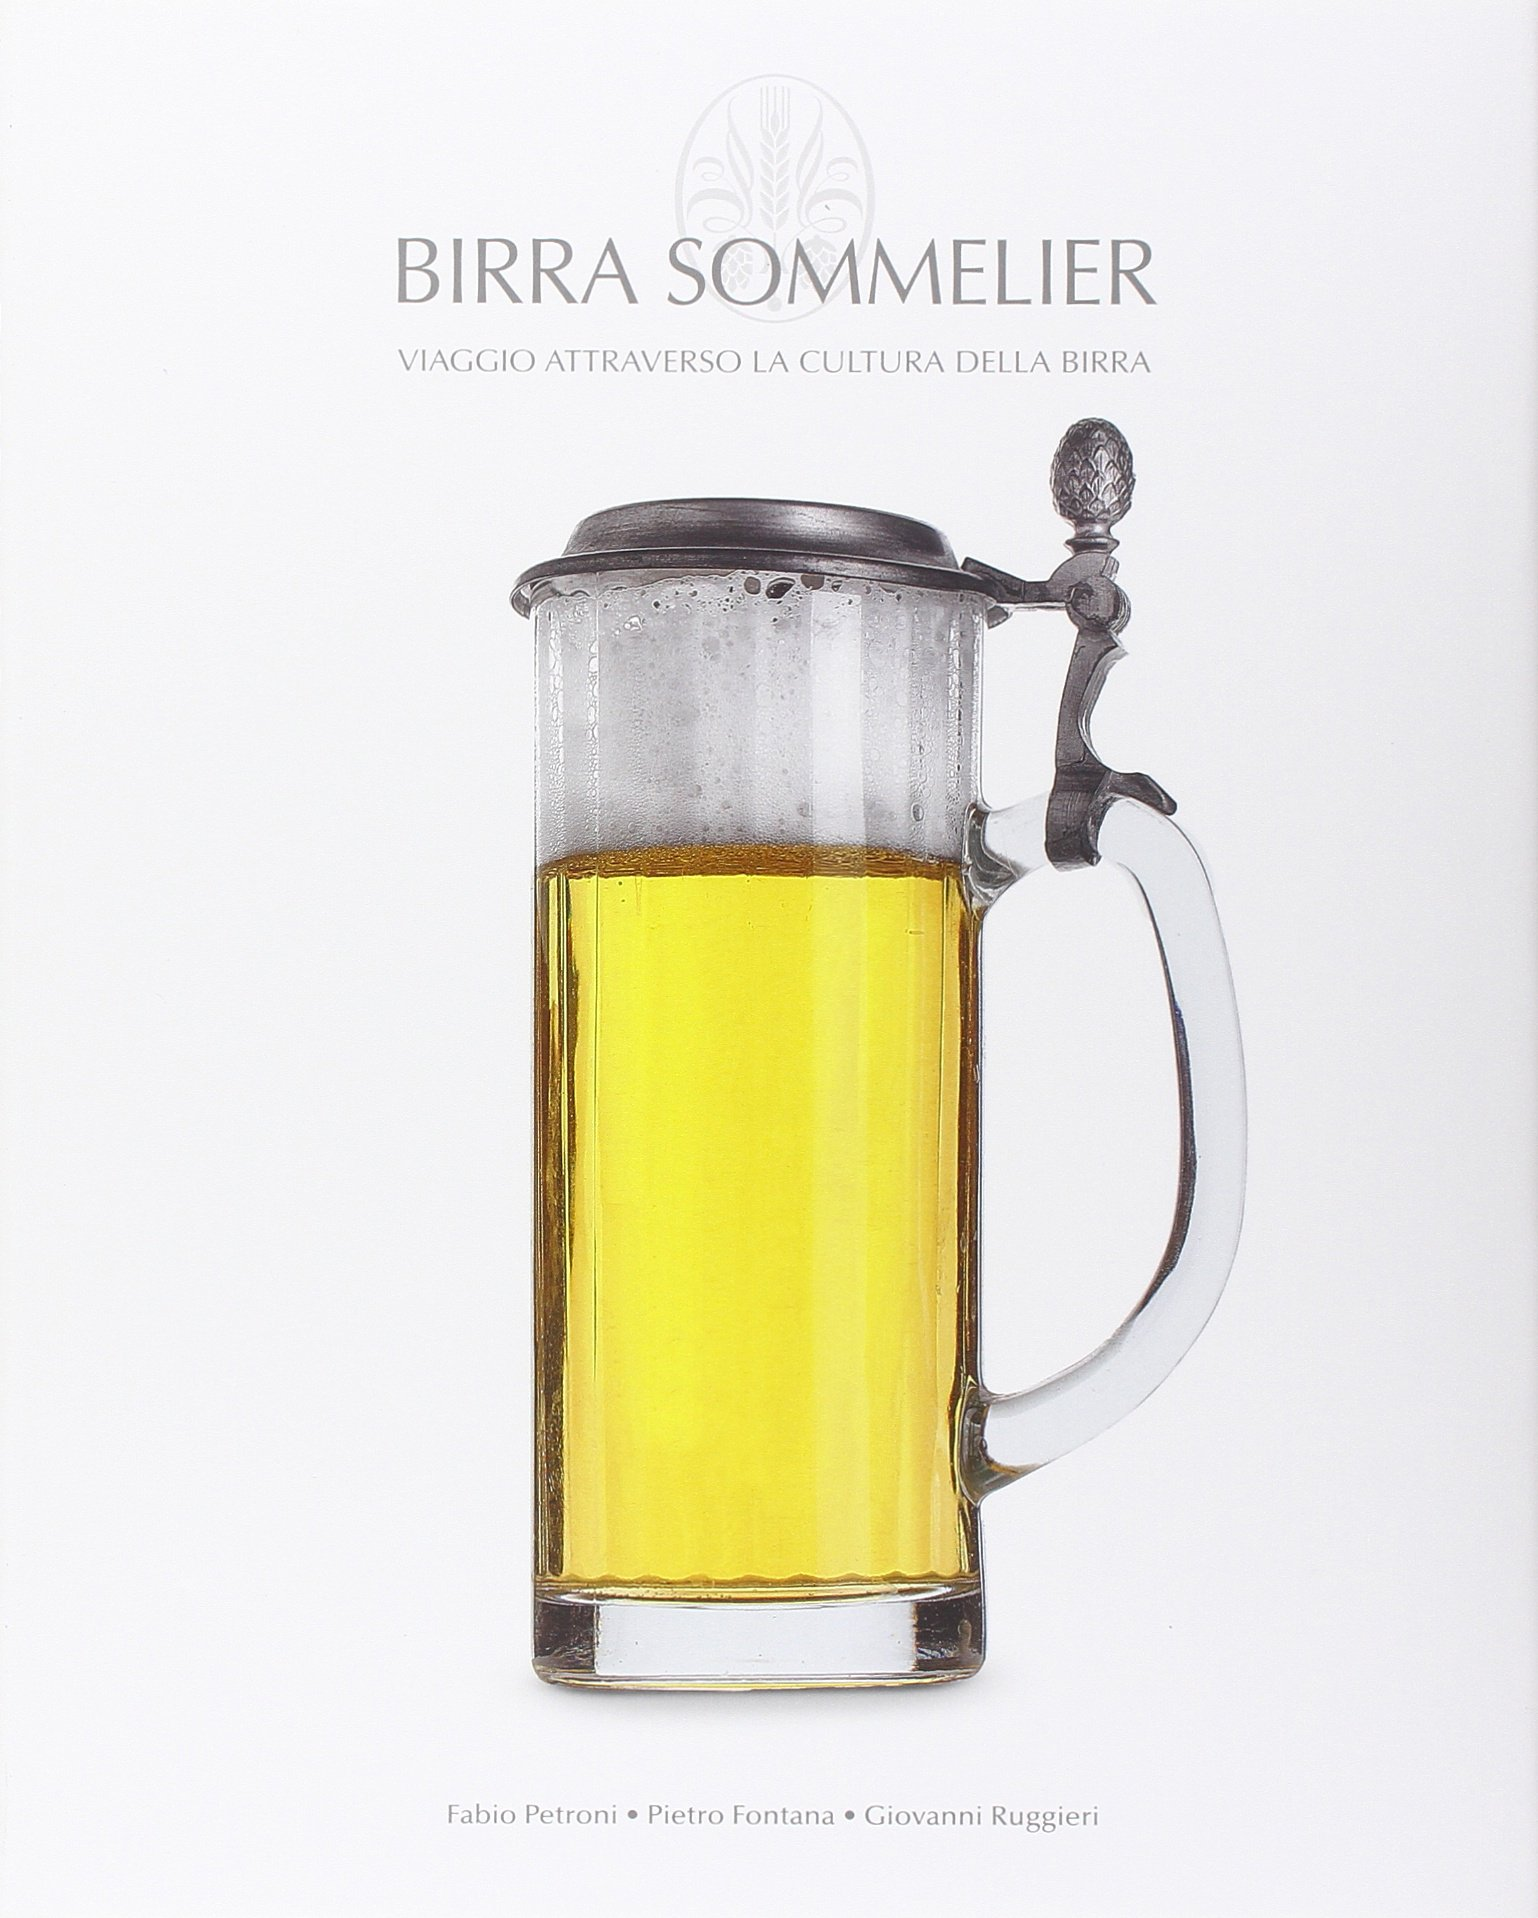 Birra sommelier